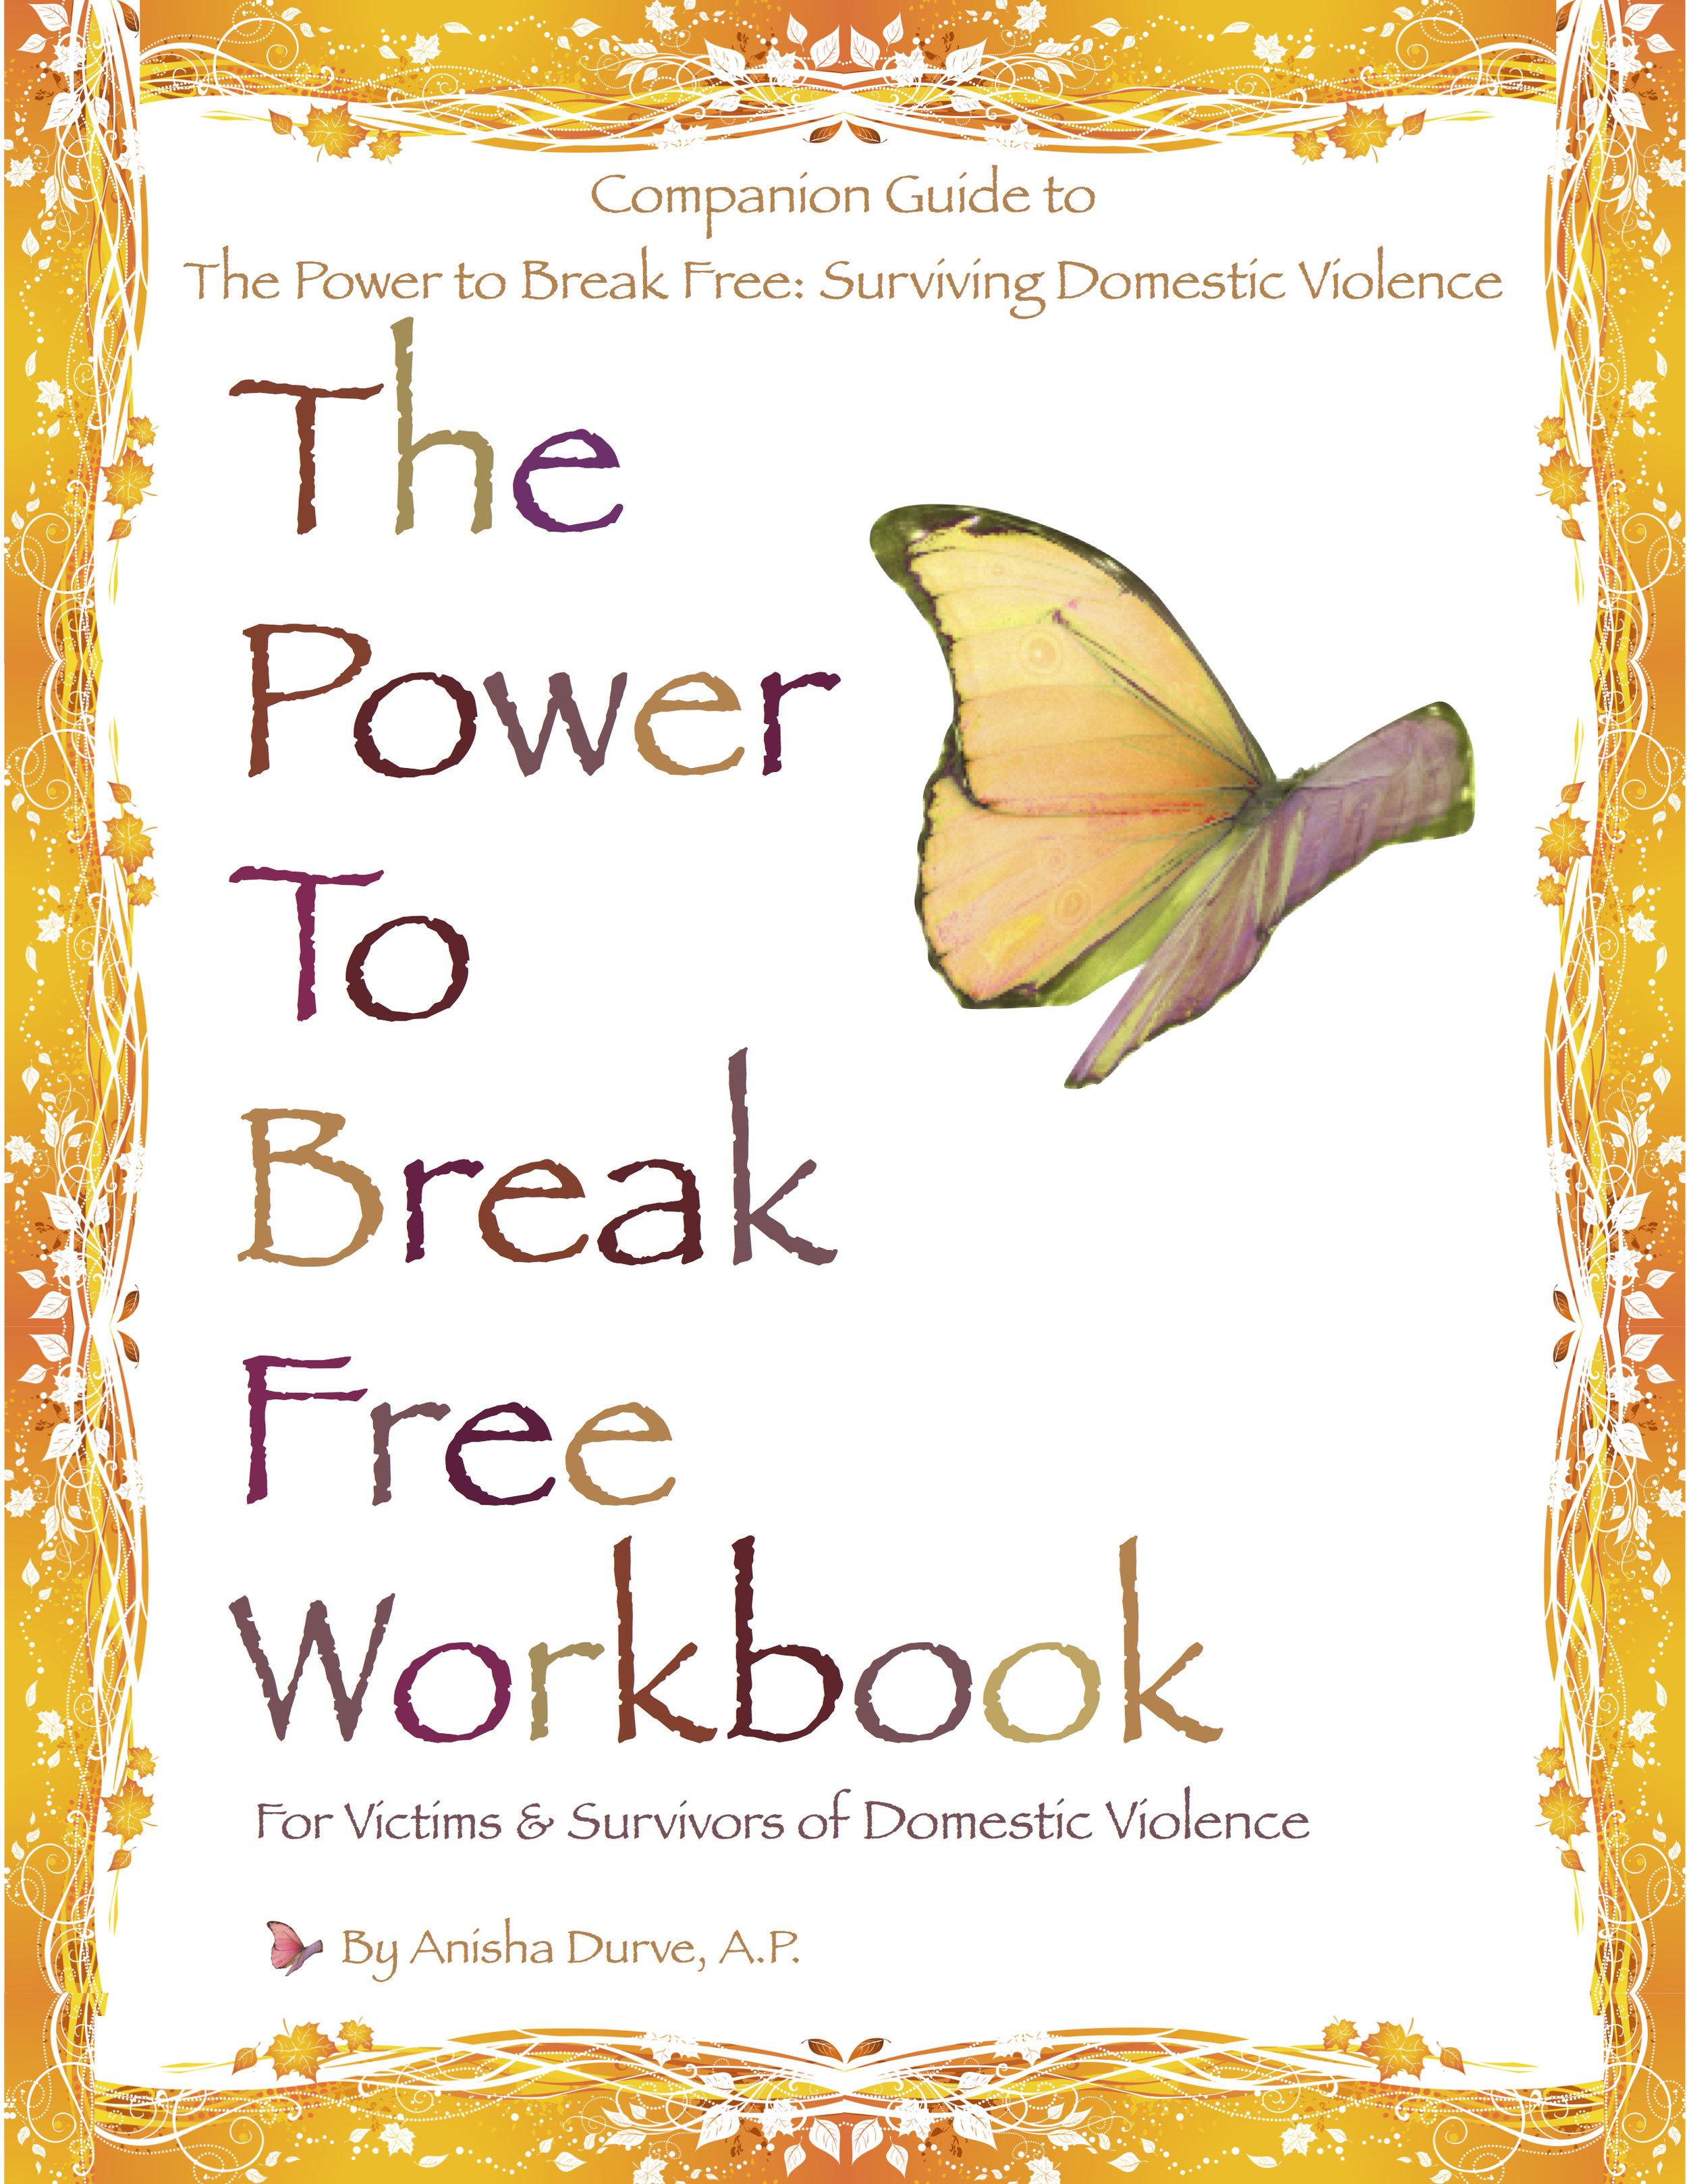 PTBF workbook cover.jpg